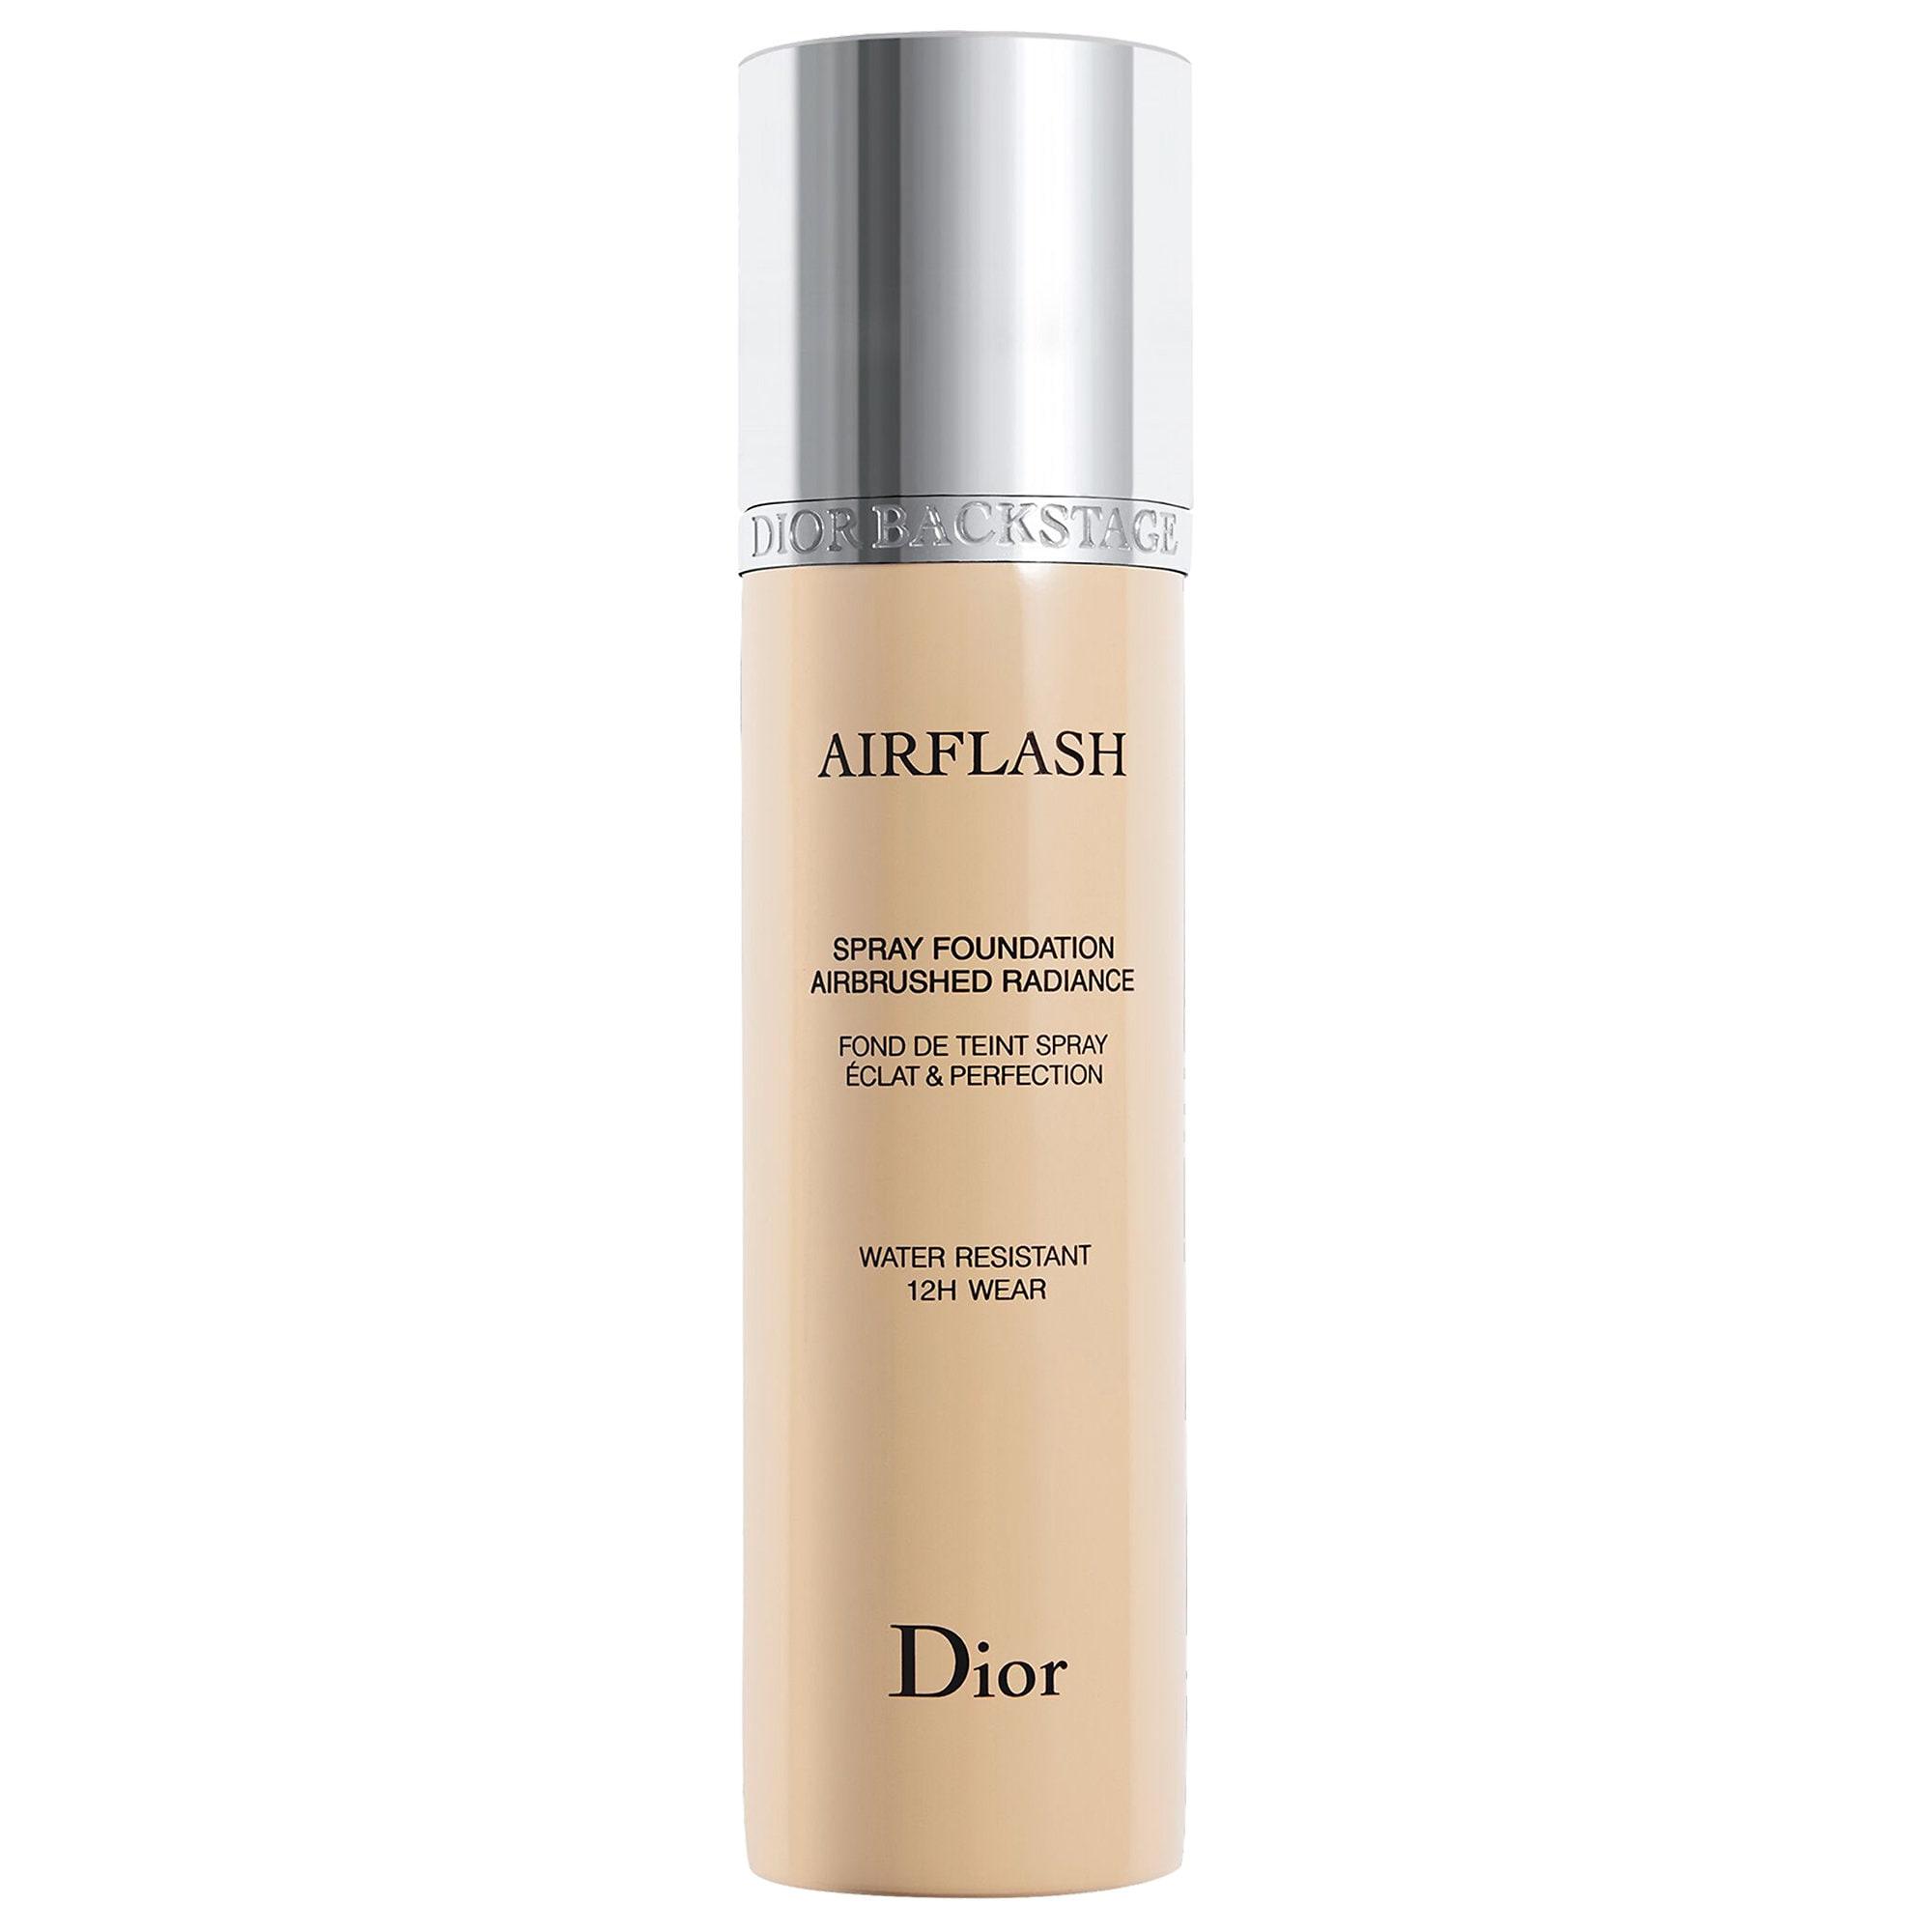 Dior - Dior Airflash Spray Foundation